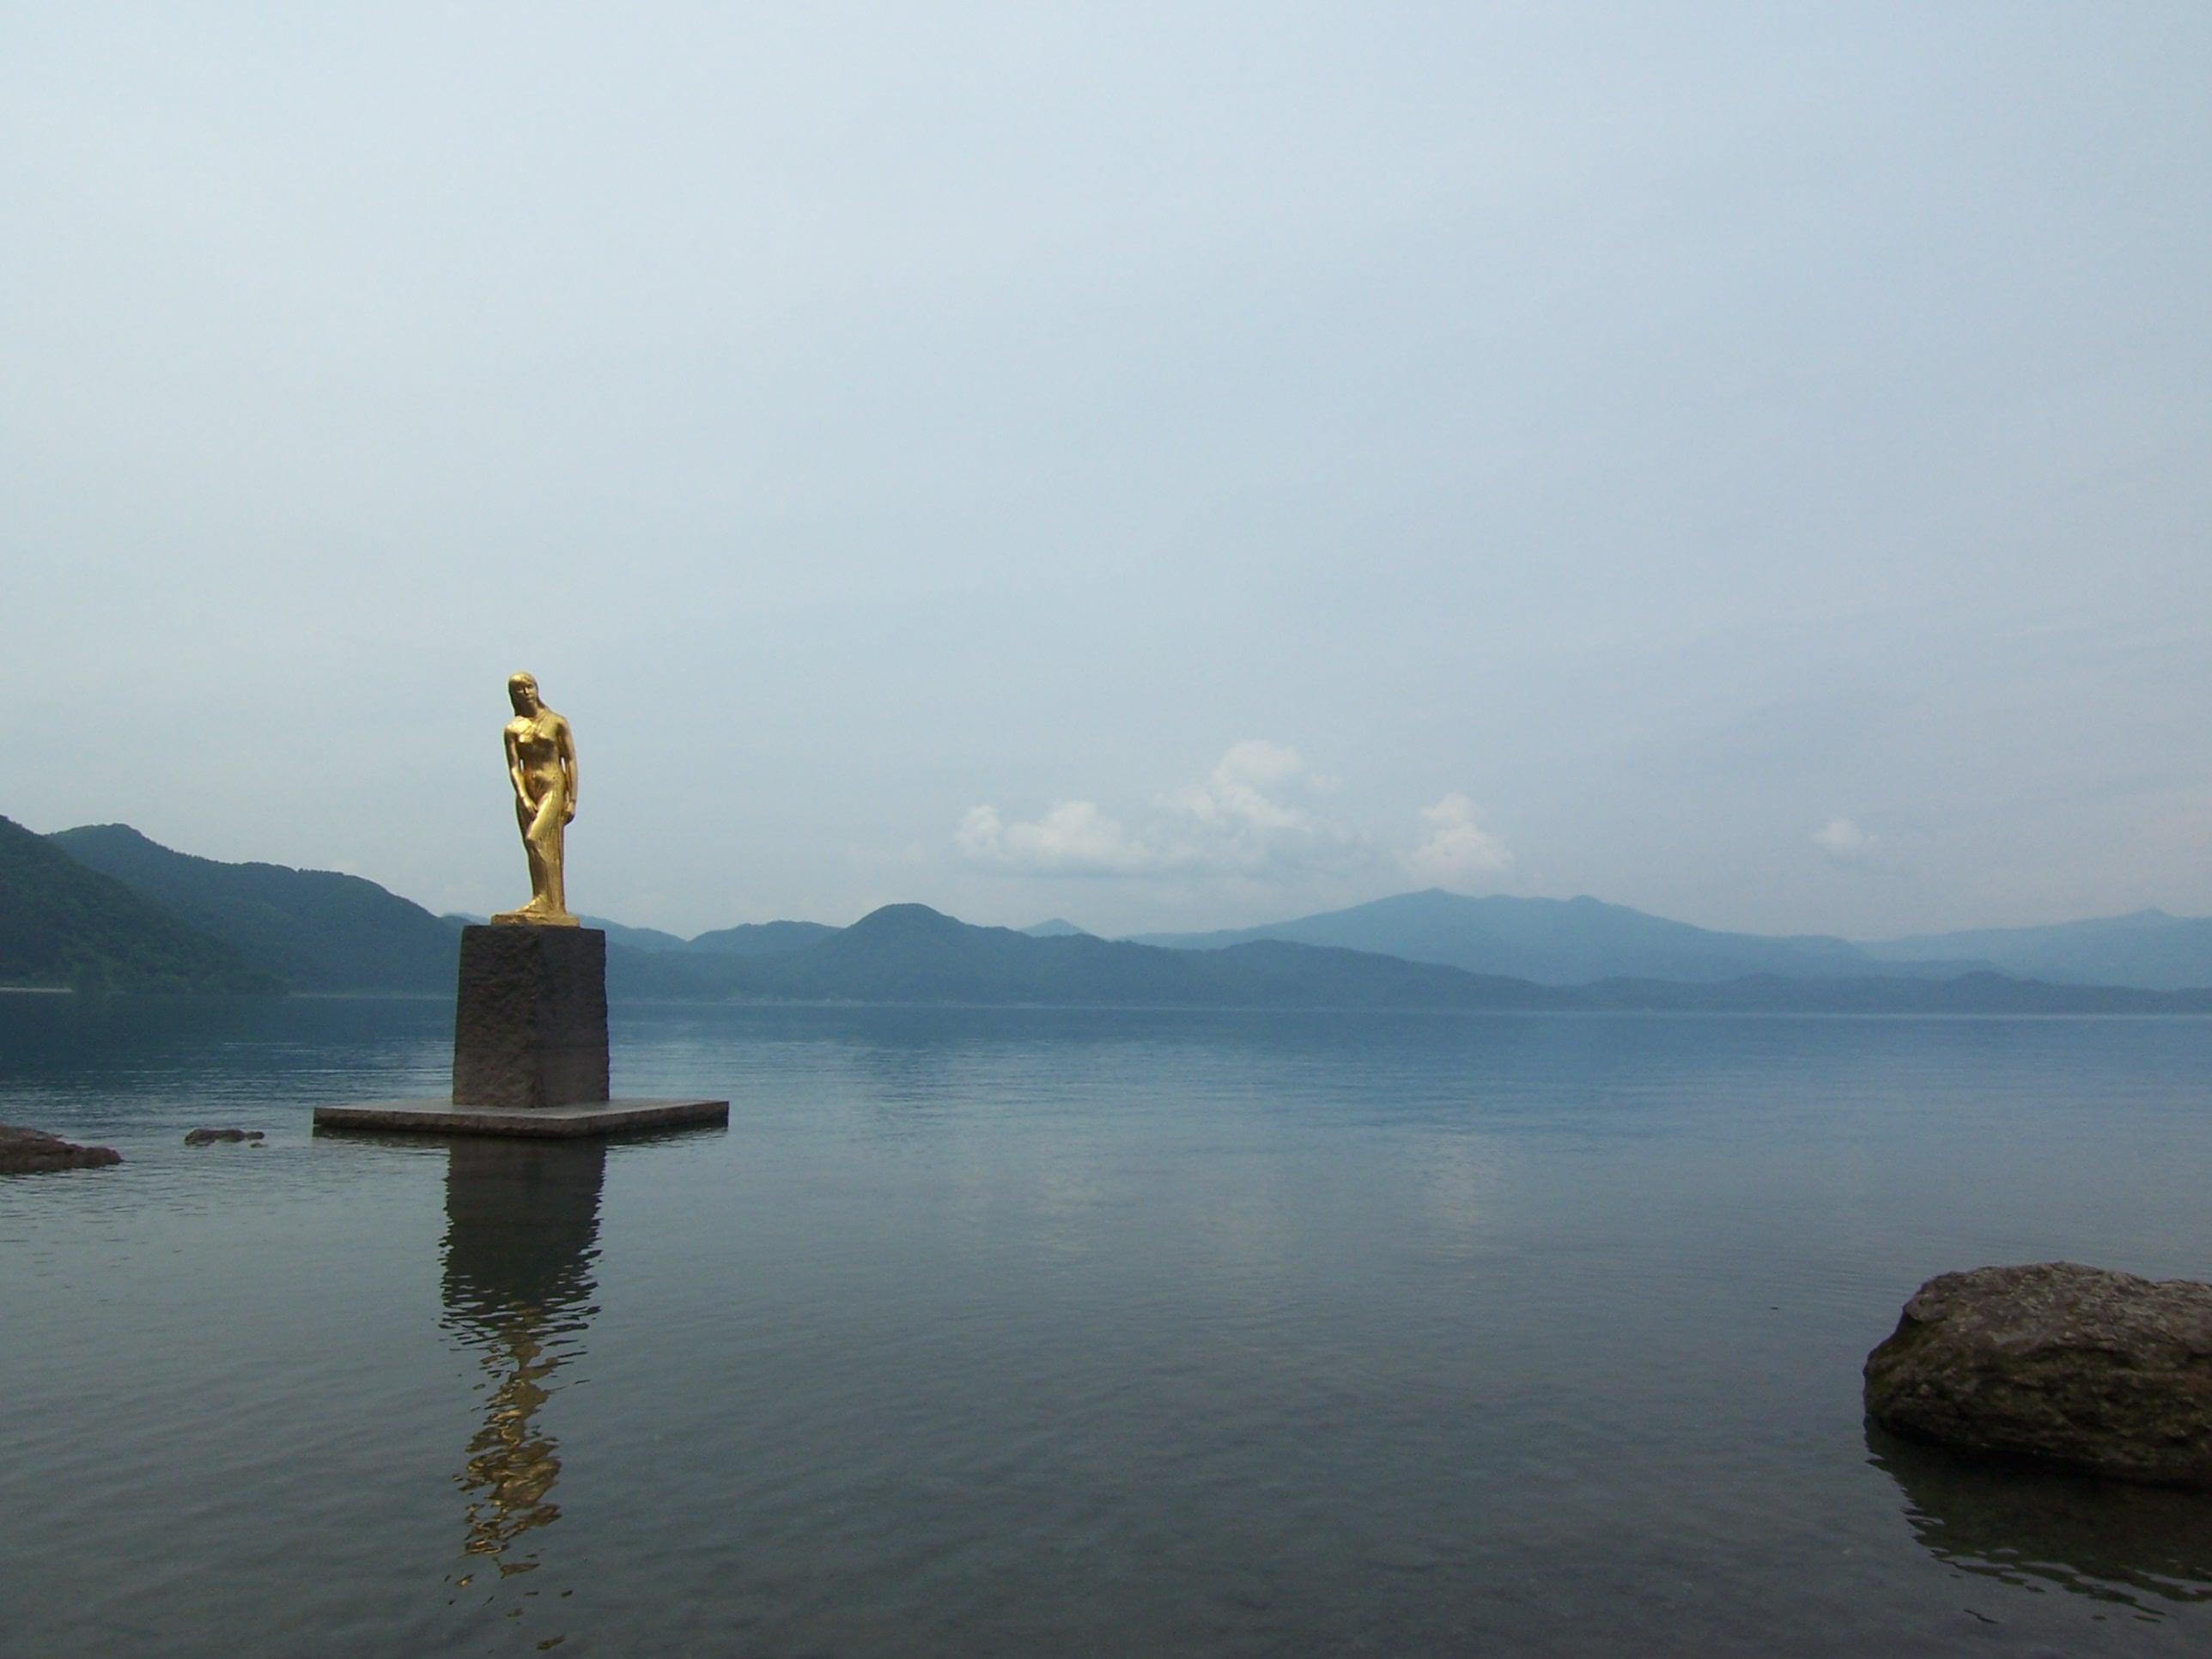 【秋田】日本一深い湖_c0348200_22024558.jpg